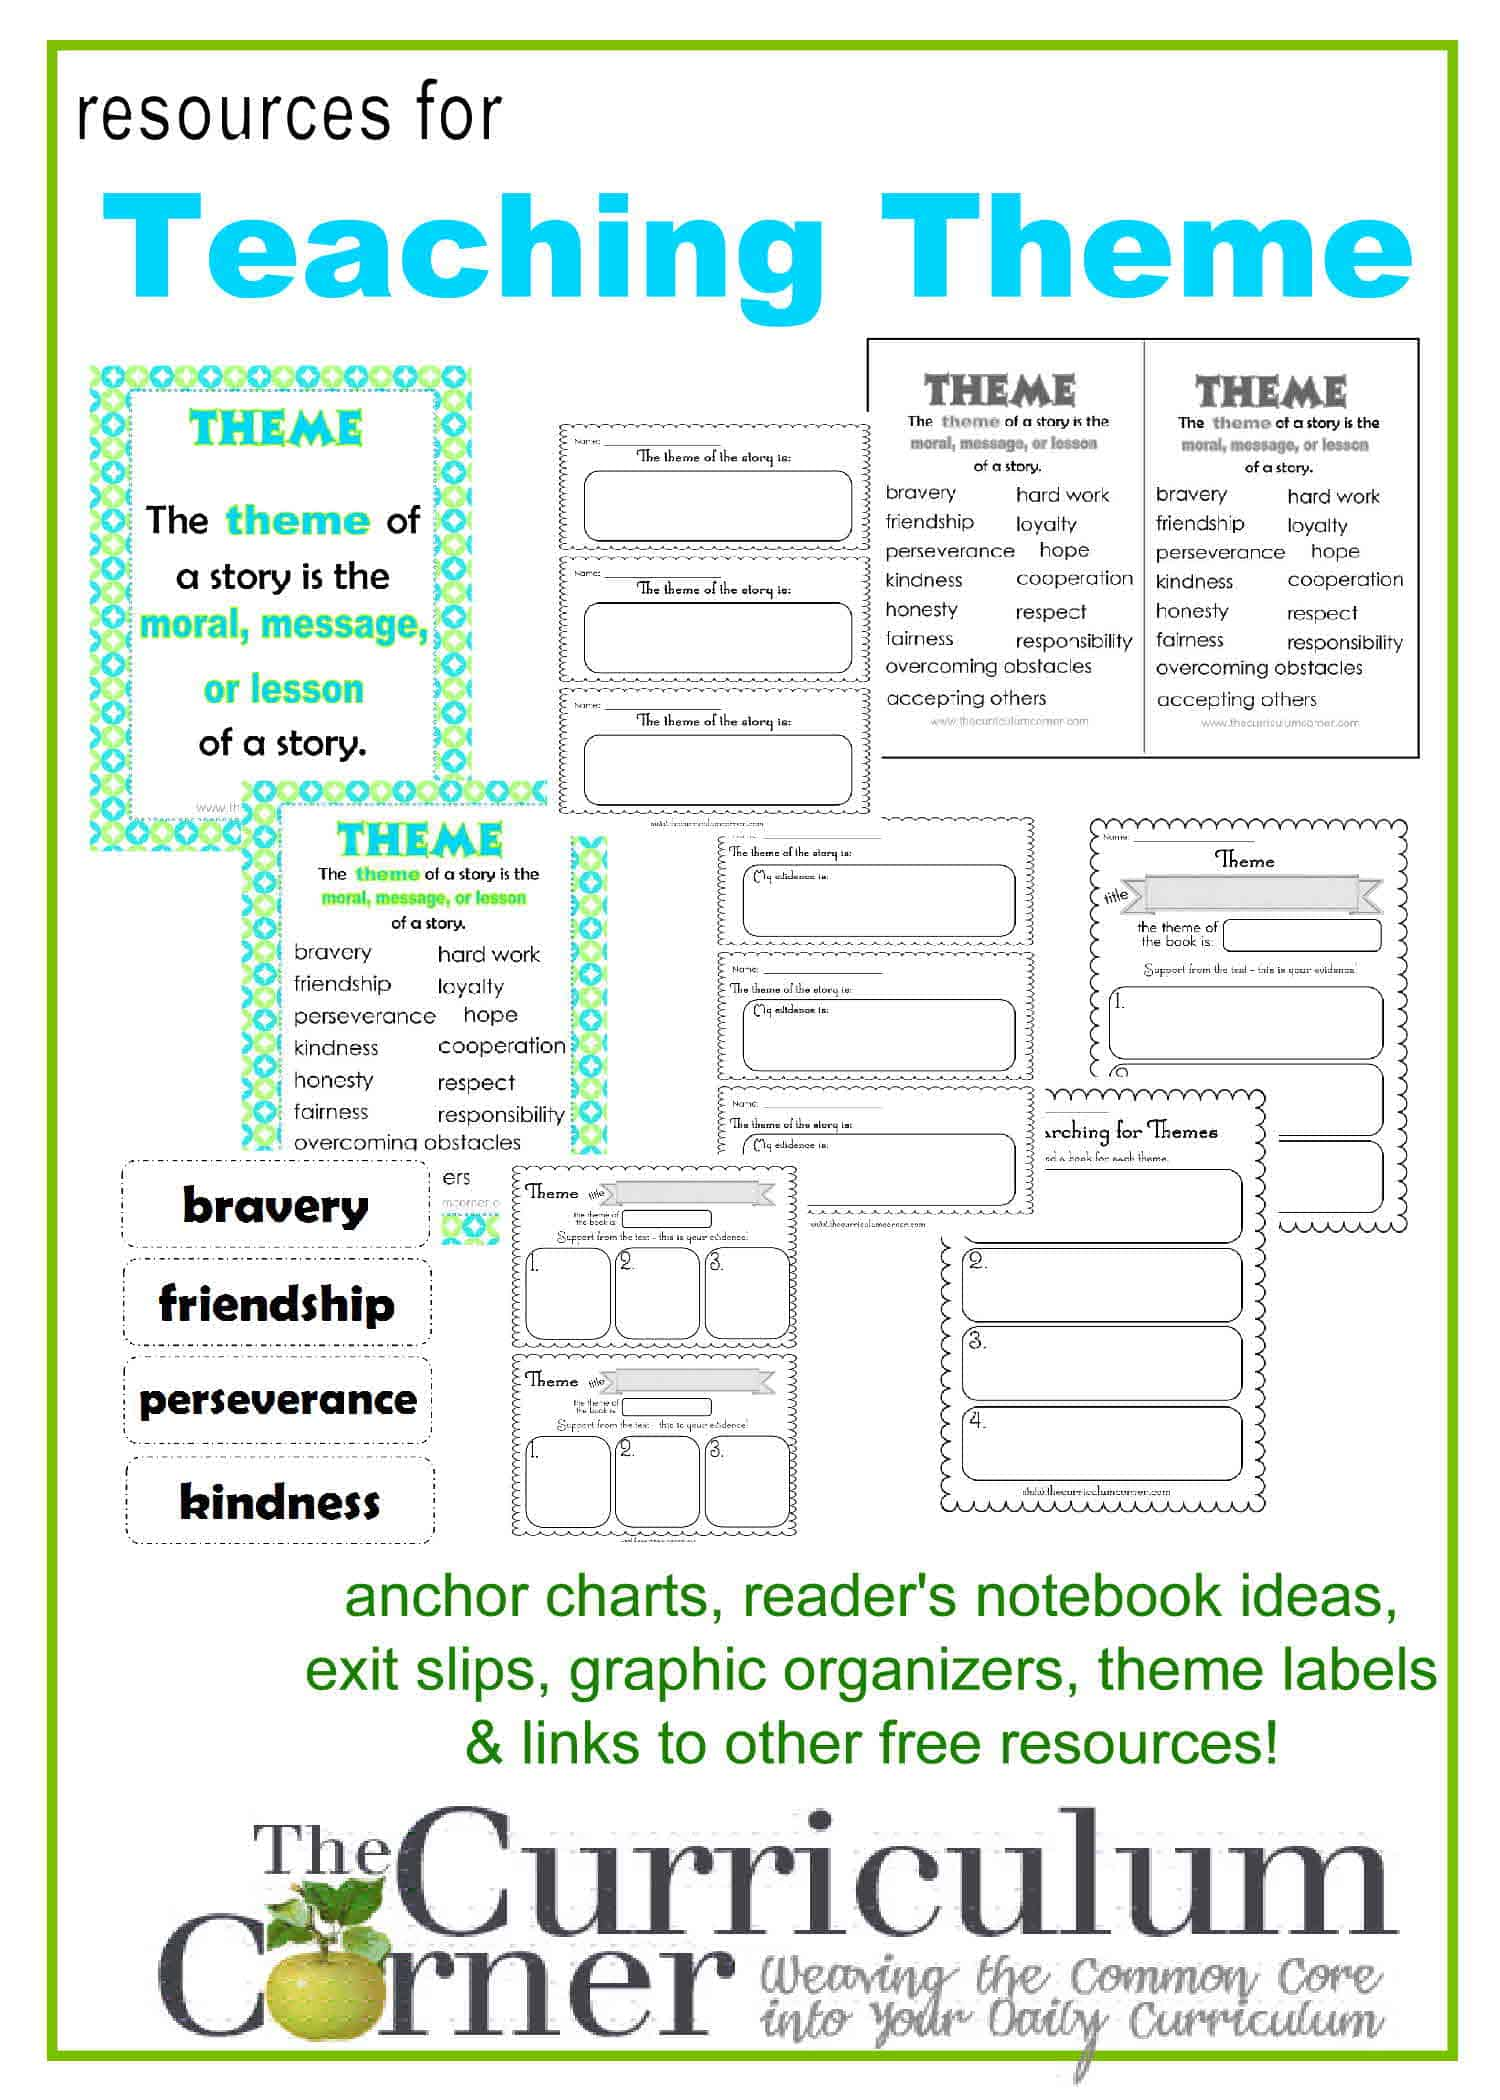 medium resolution of Teaching Theme in Reading - The Curriculum Corner 123